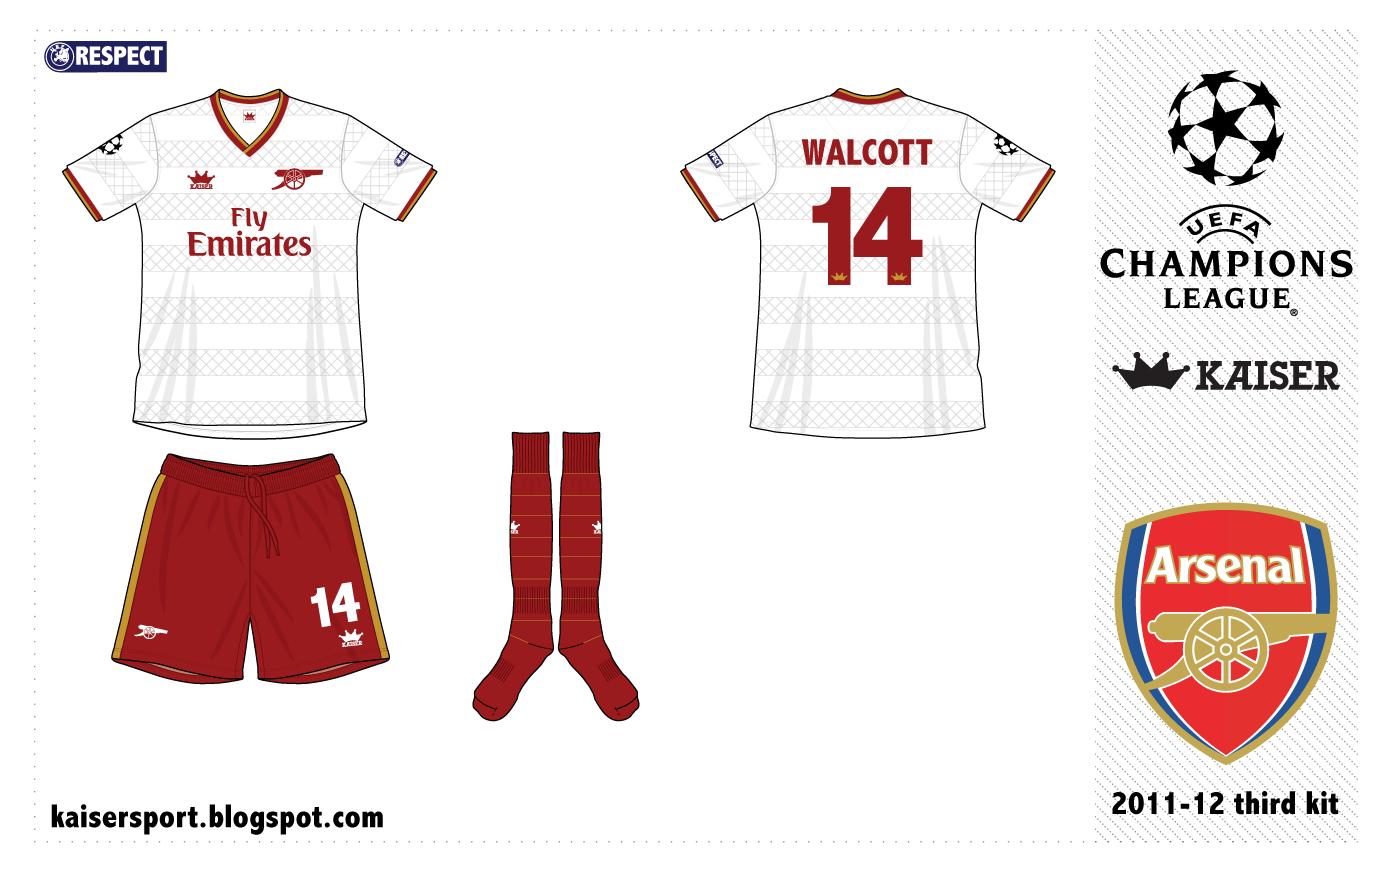 Kaiser Sport: Arsenal Fantasy Kits